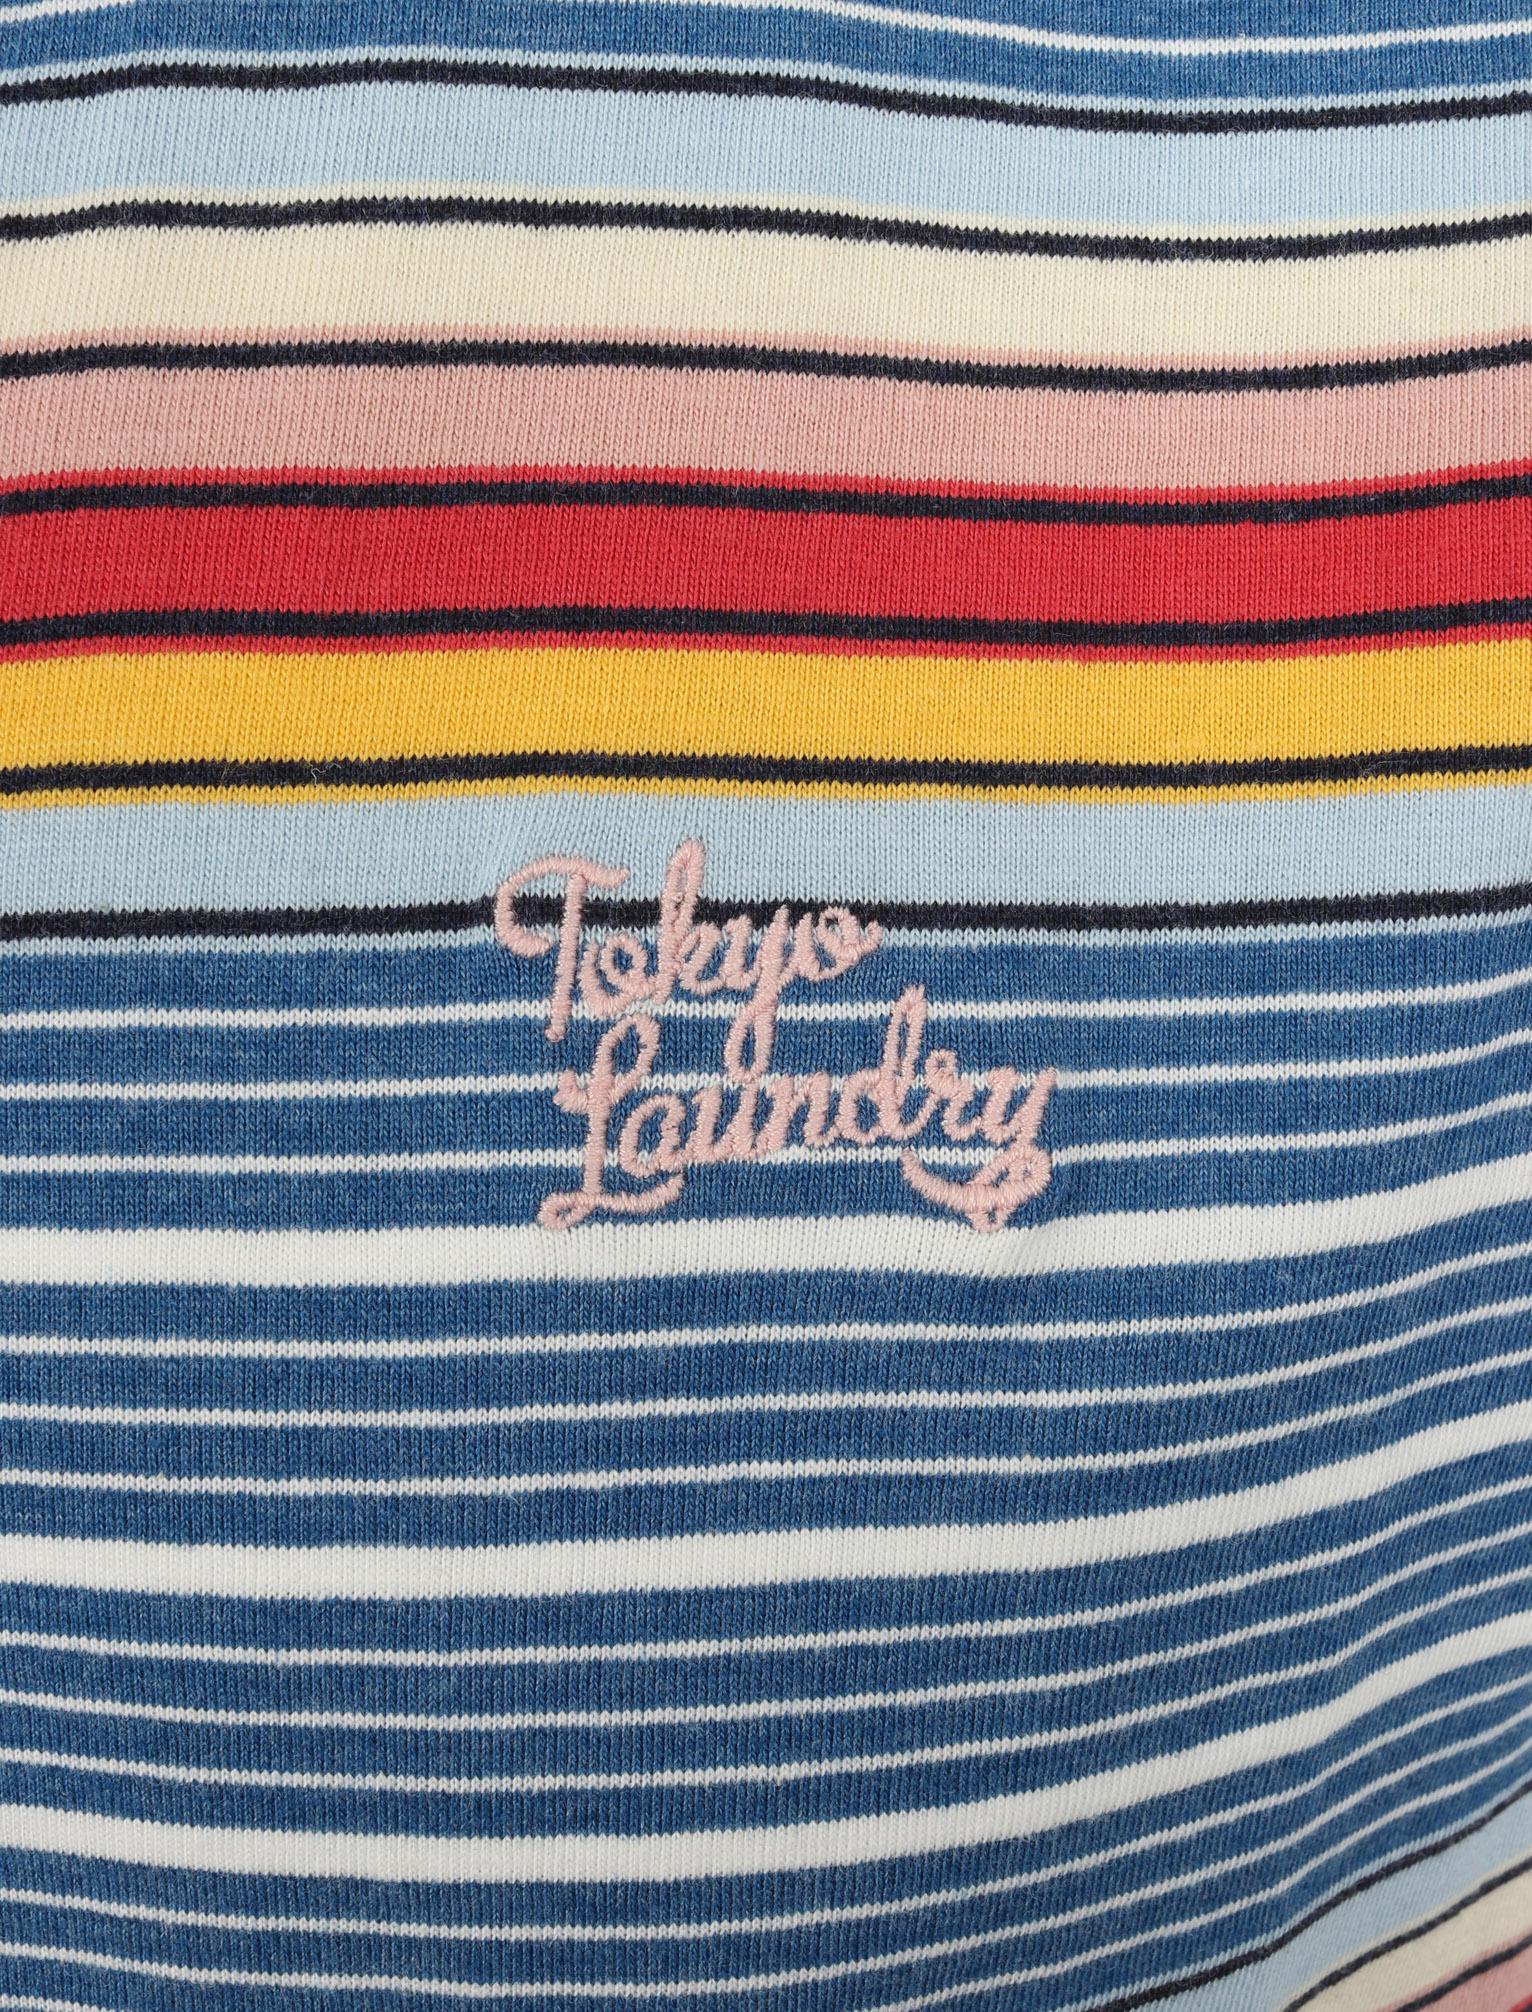 Tokyo-Laundry-Men-039-s-Lowell-Crew-Neck-Striped-T-Shirt-Stripy-Retro-Rainbow-Top thumbnail 5